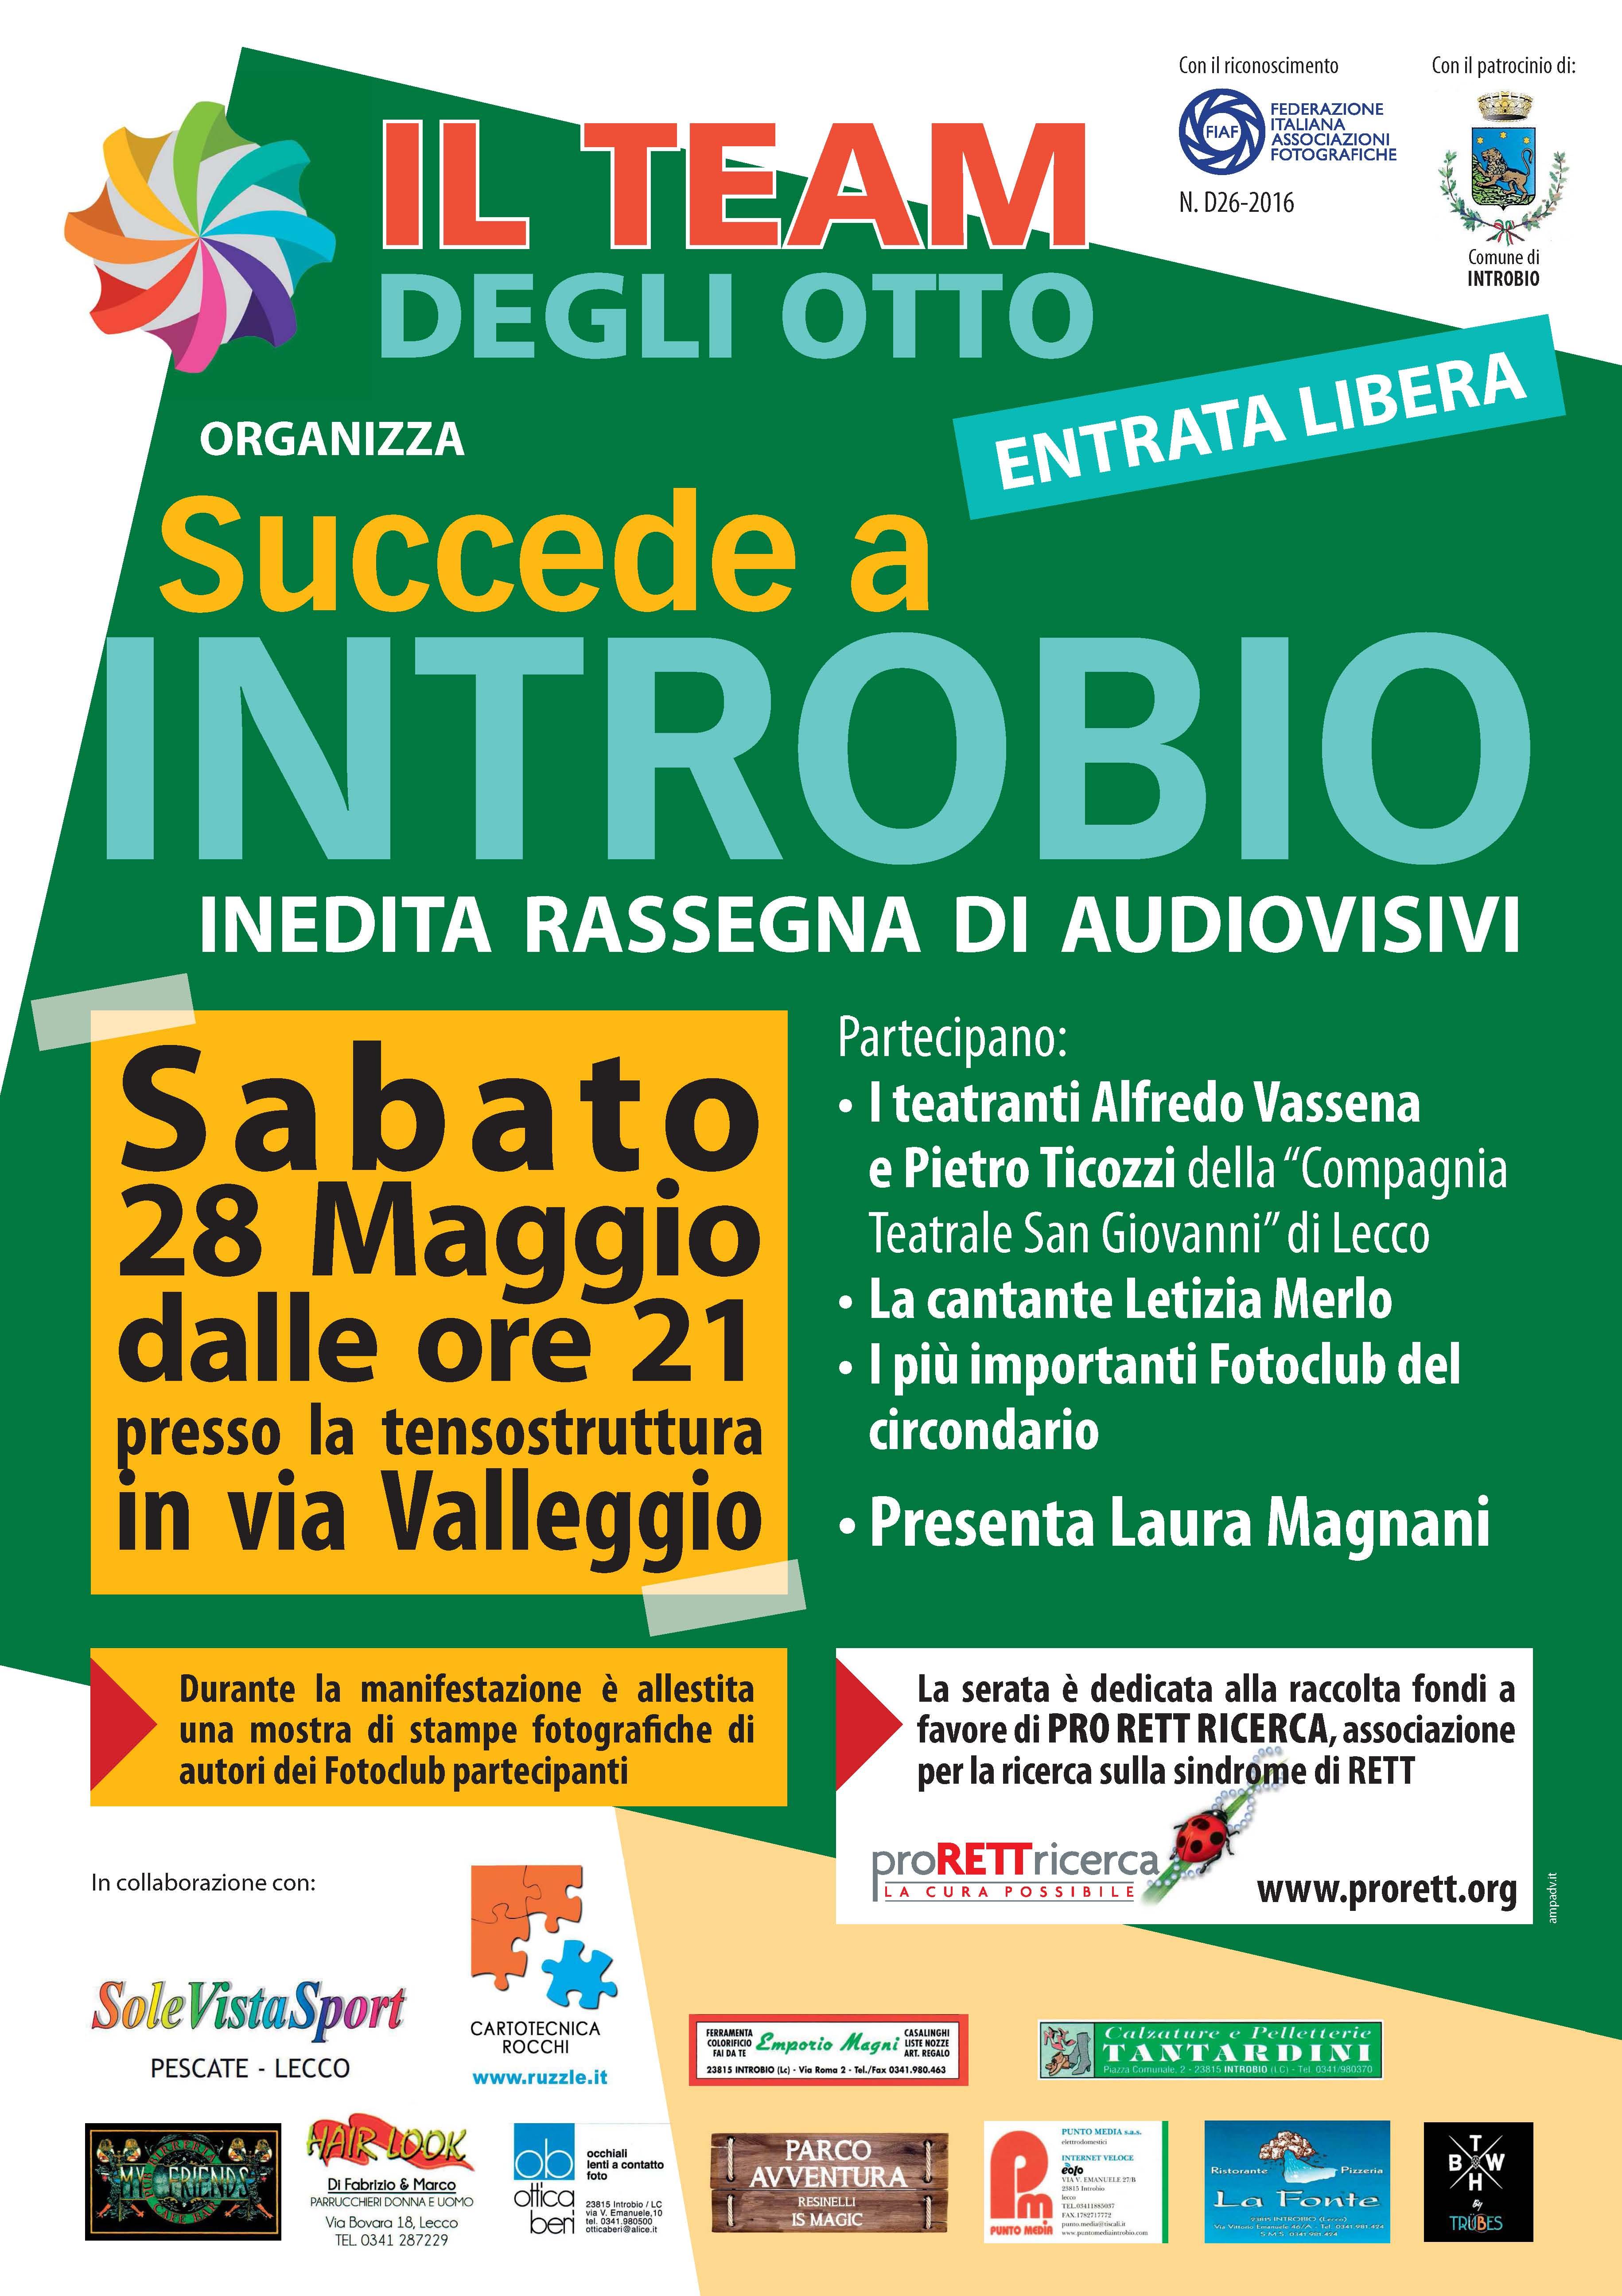 Succede-a-Introbio_Locandina-2016